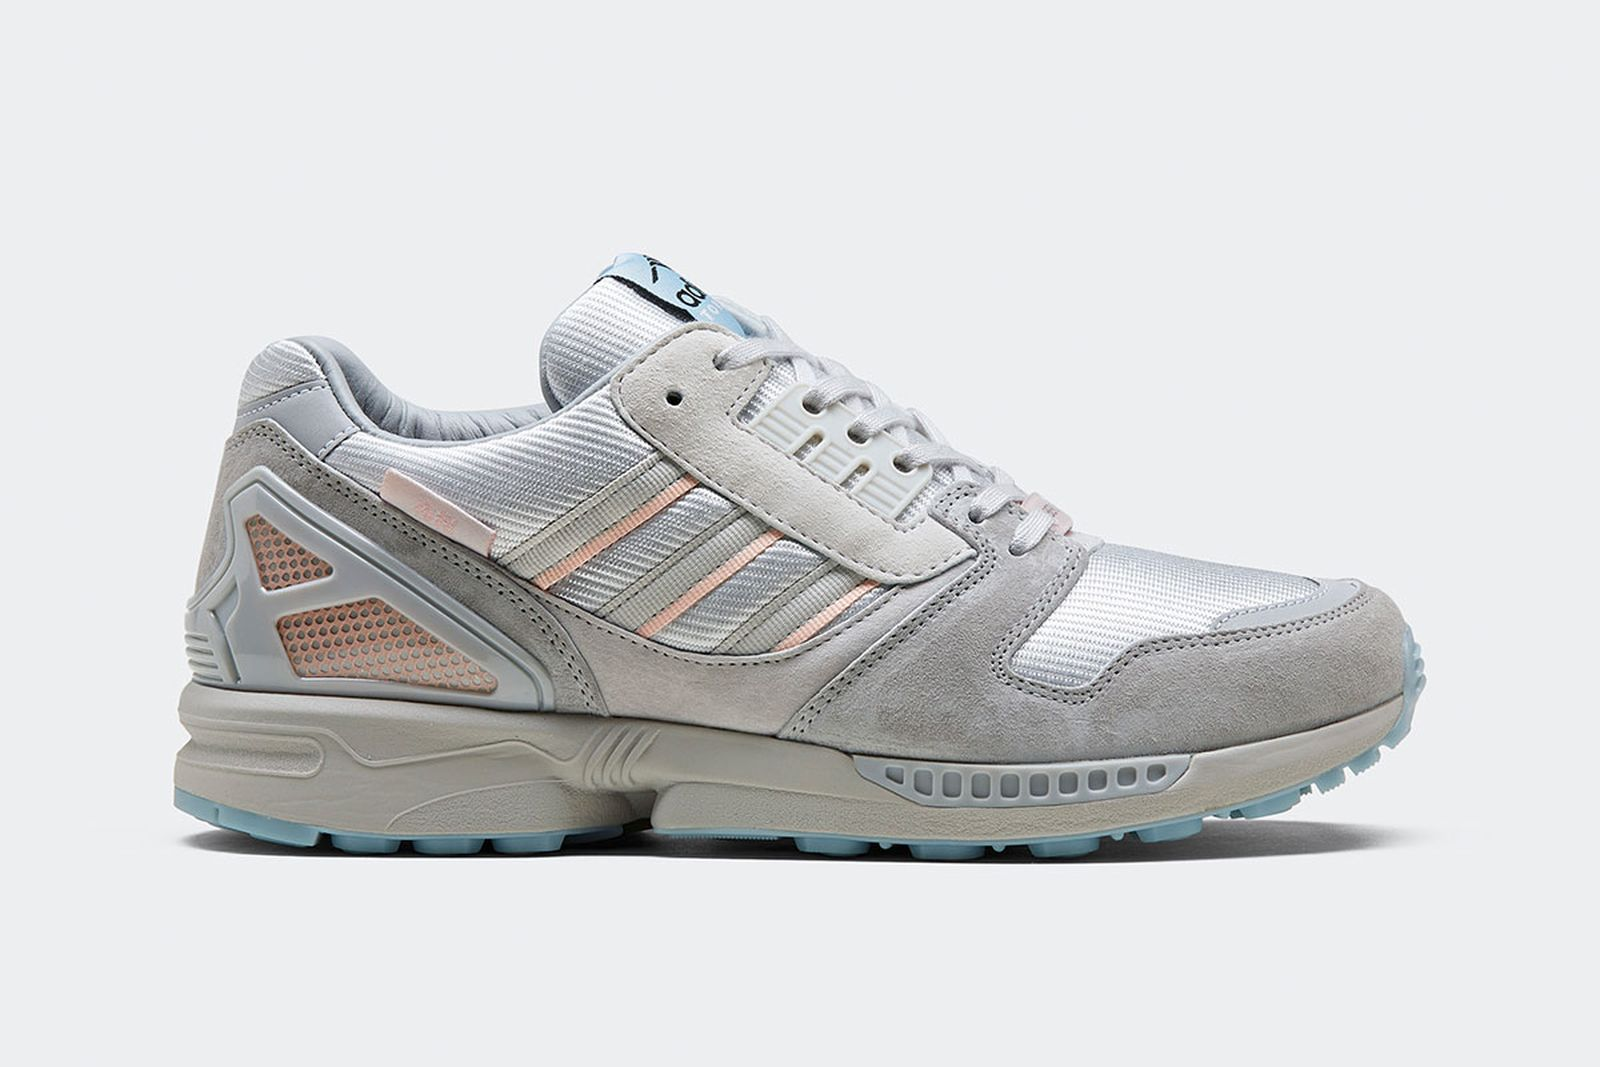 adidas-originals-zx-8000-kirschblutenallee-release-date-price-05